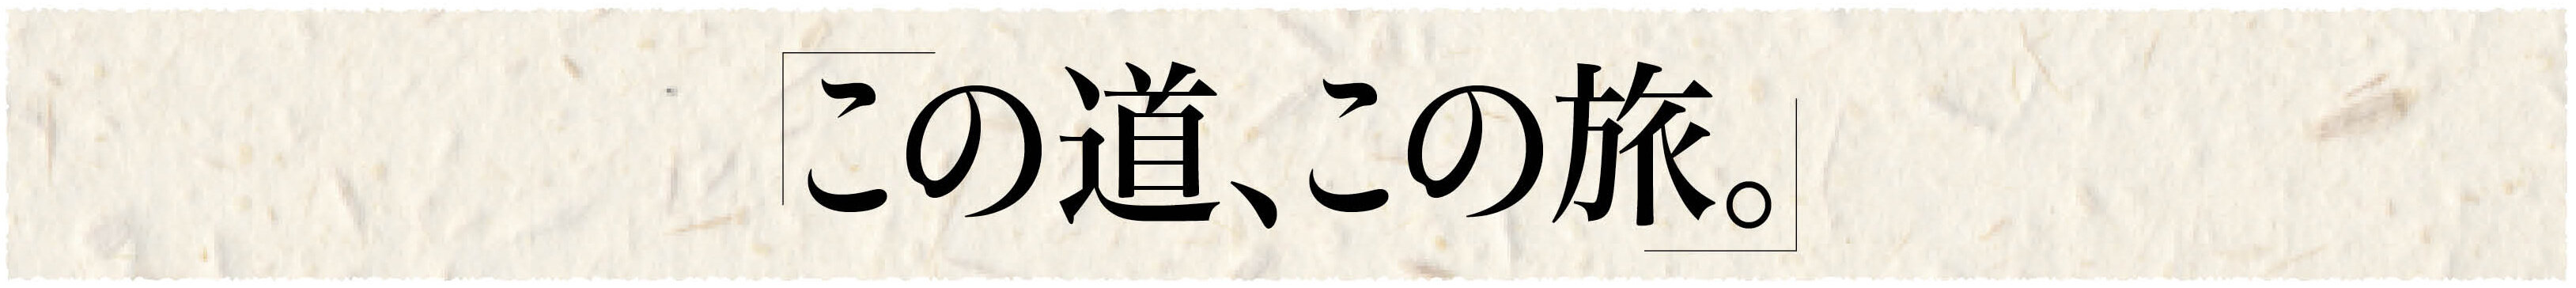 【YANASE presents 】「この道、この旅。」~長野県・塩の道(千国街道) 編 - タイトル_2